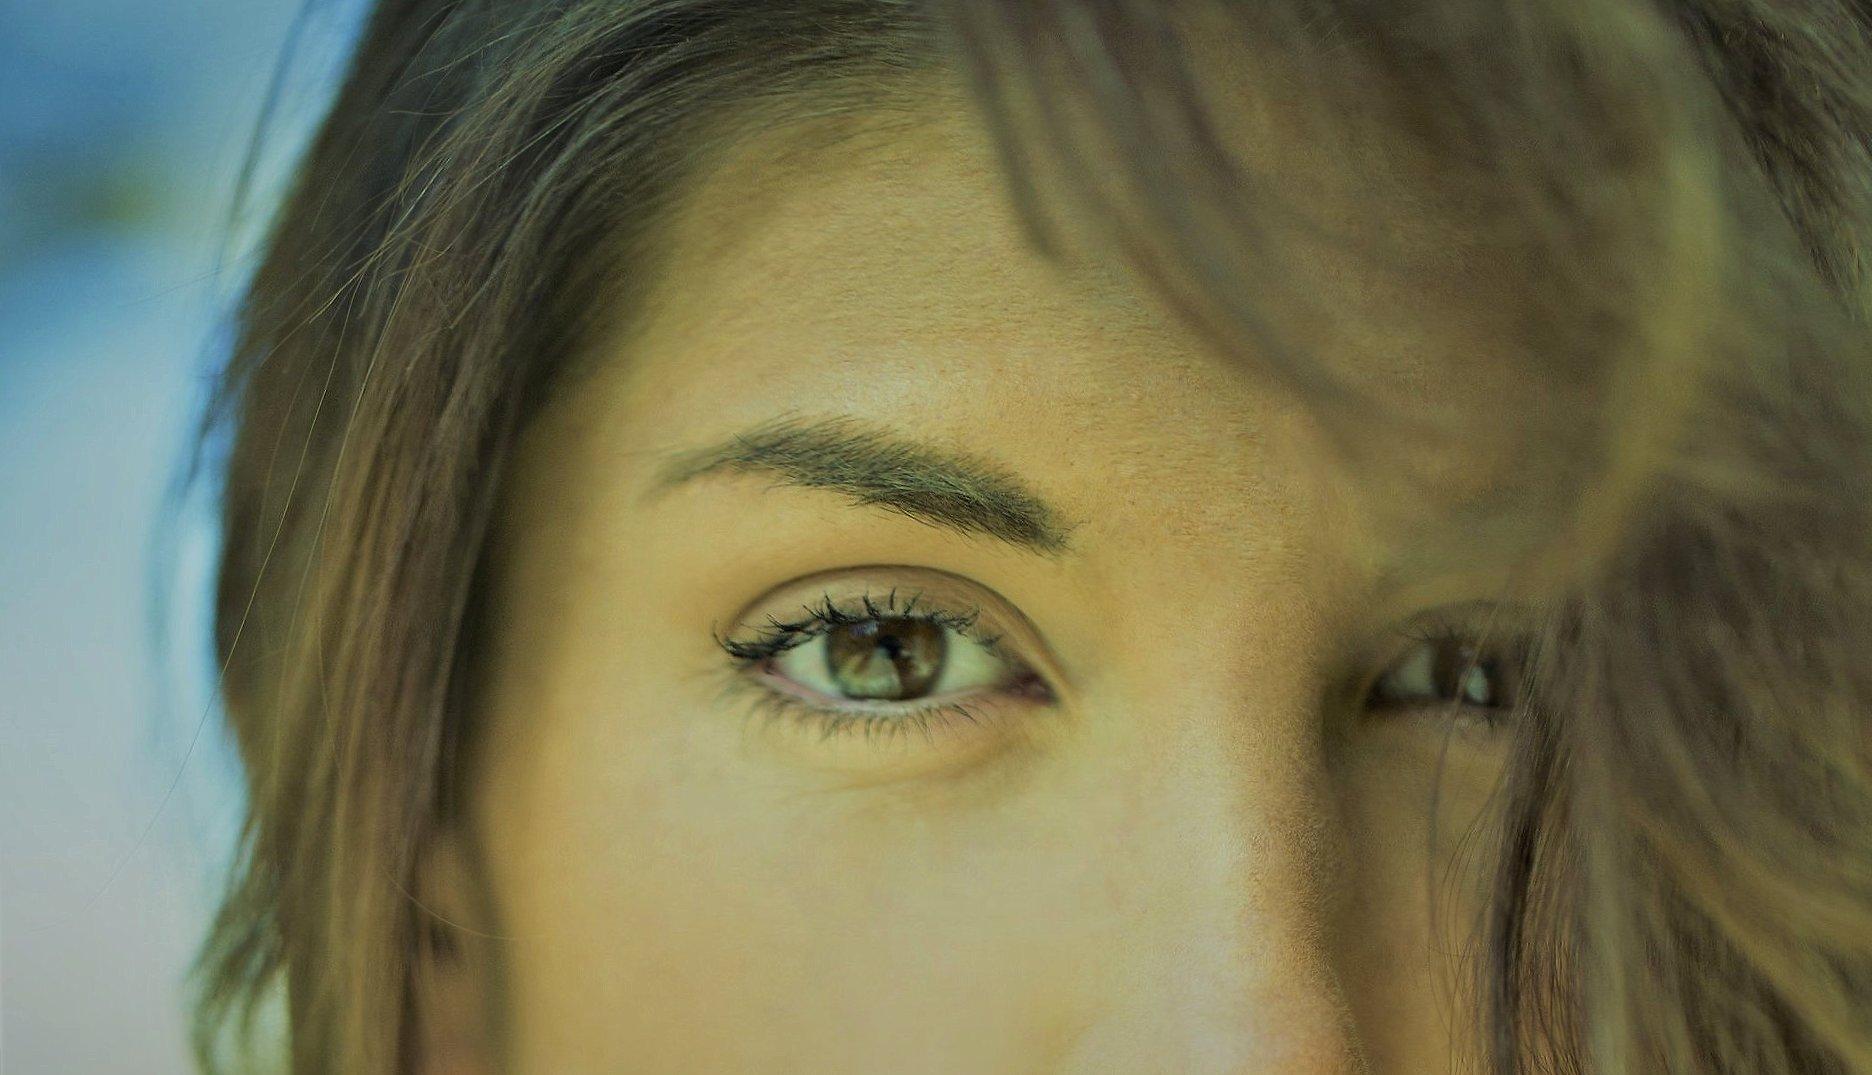 Eye wallpapers HD quality